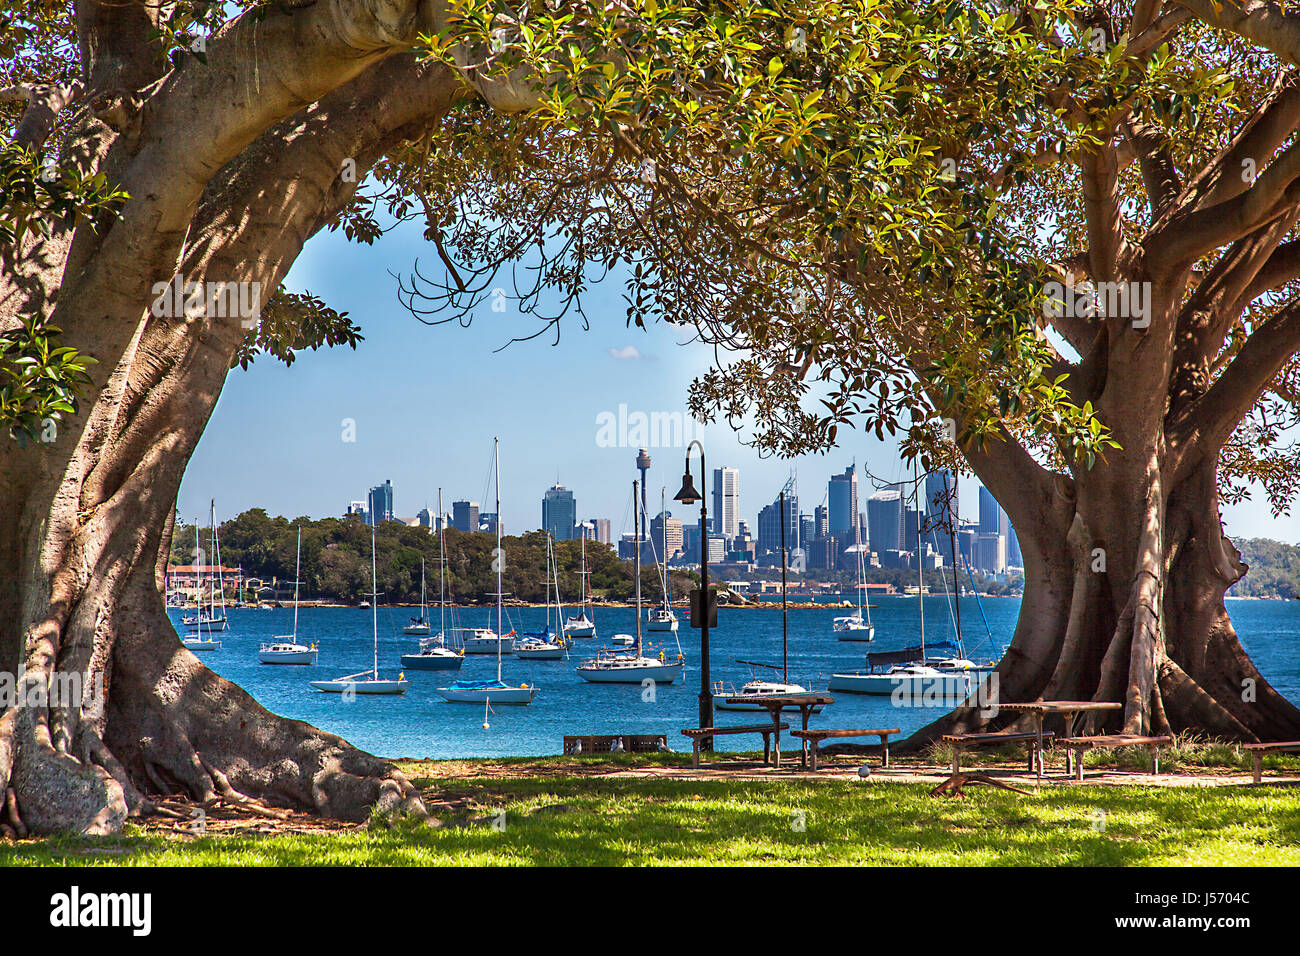 Camp Cove Beach View of Sydney Australia - Stock Image